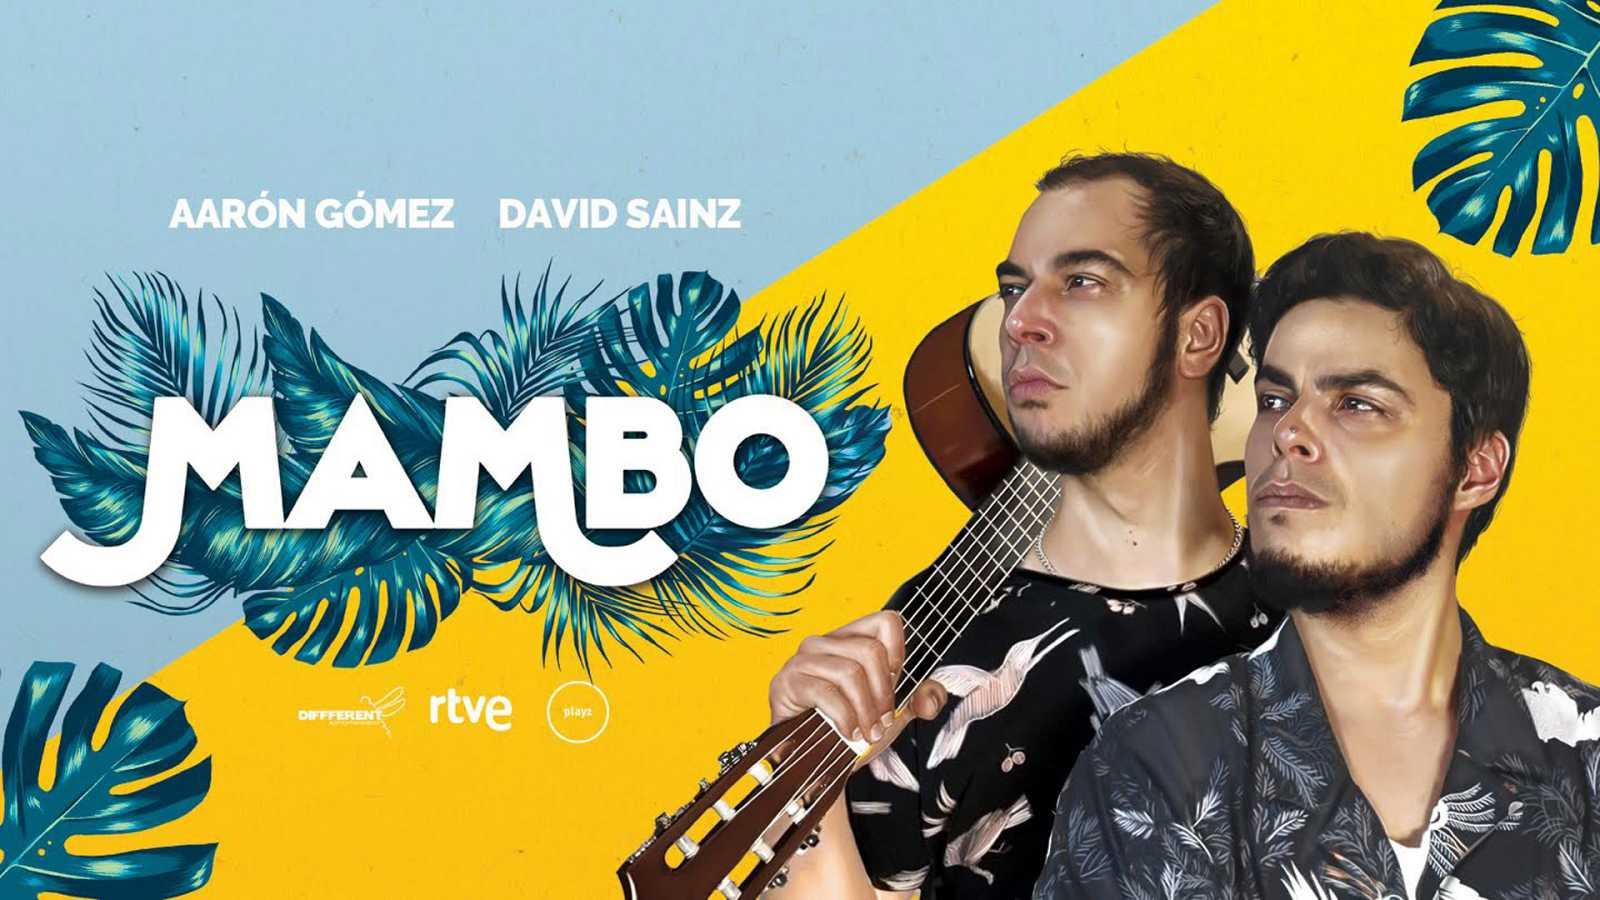 Cartel promocional de 'Mambo'